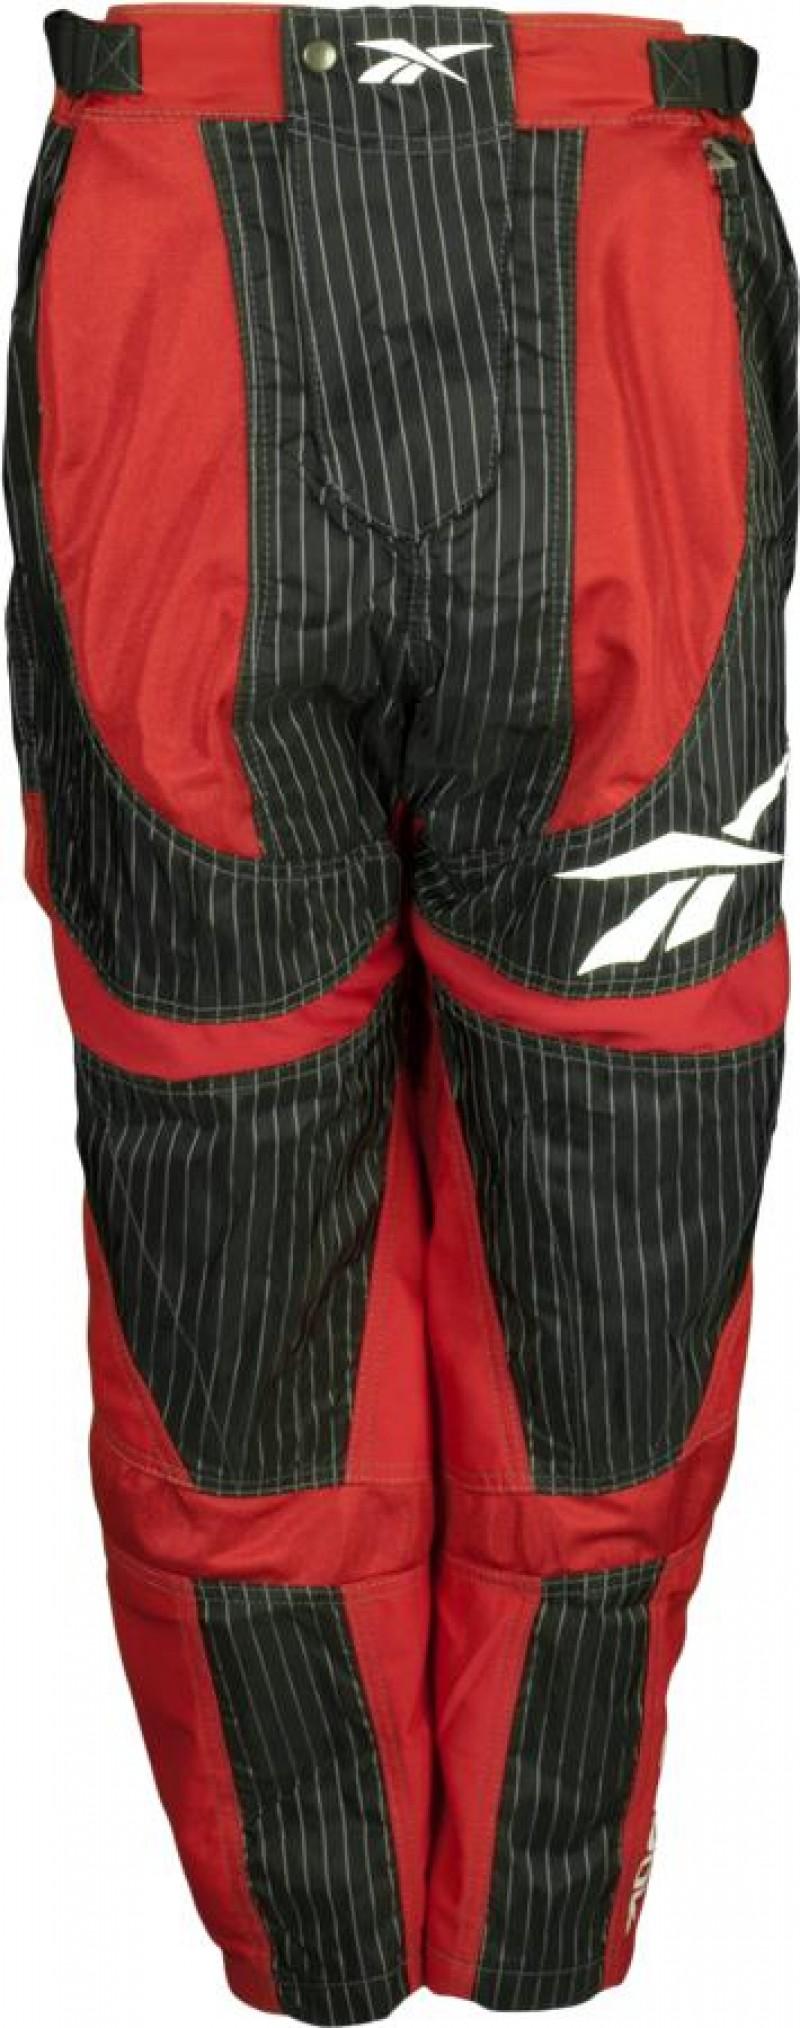 "Reebok 7K 2011"" Roller Hockey Pants"